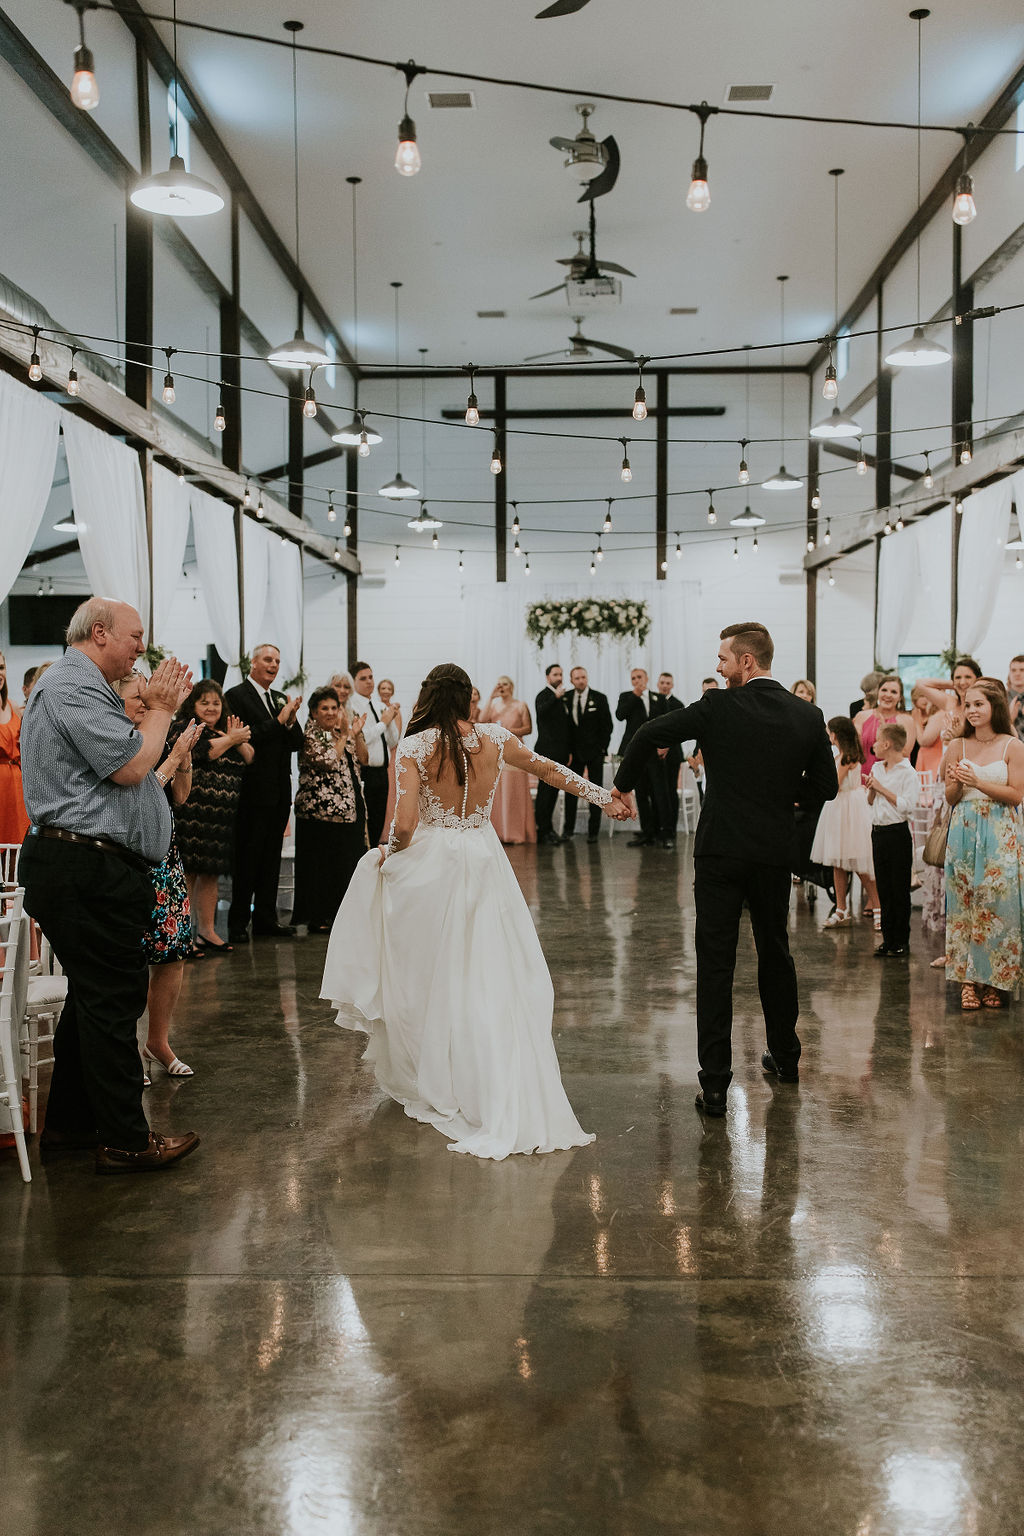 Bright light white barn wedding venue with a view Tulsa Oklahoma 52a.jpg